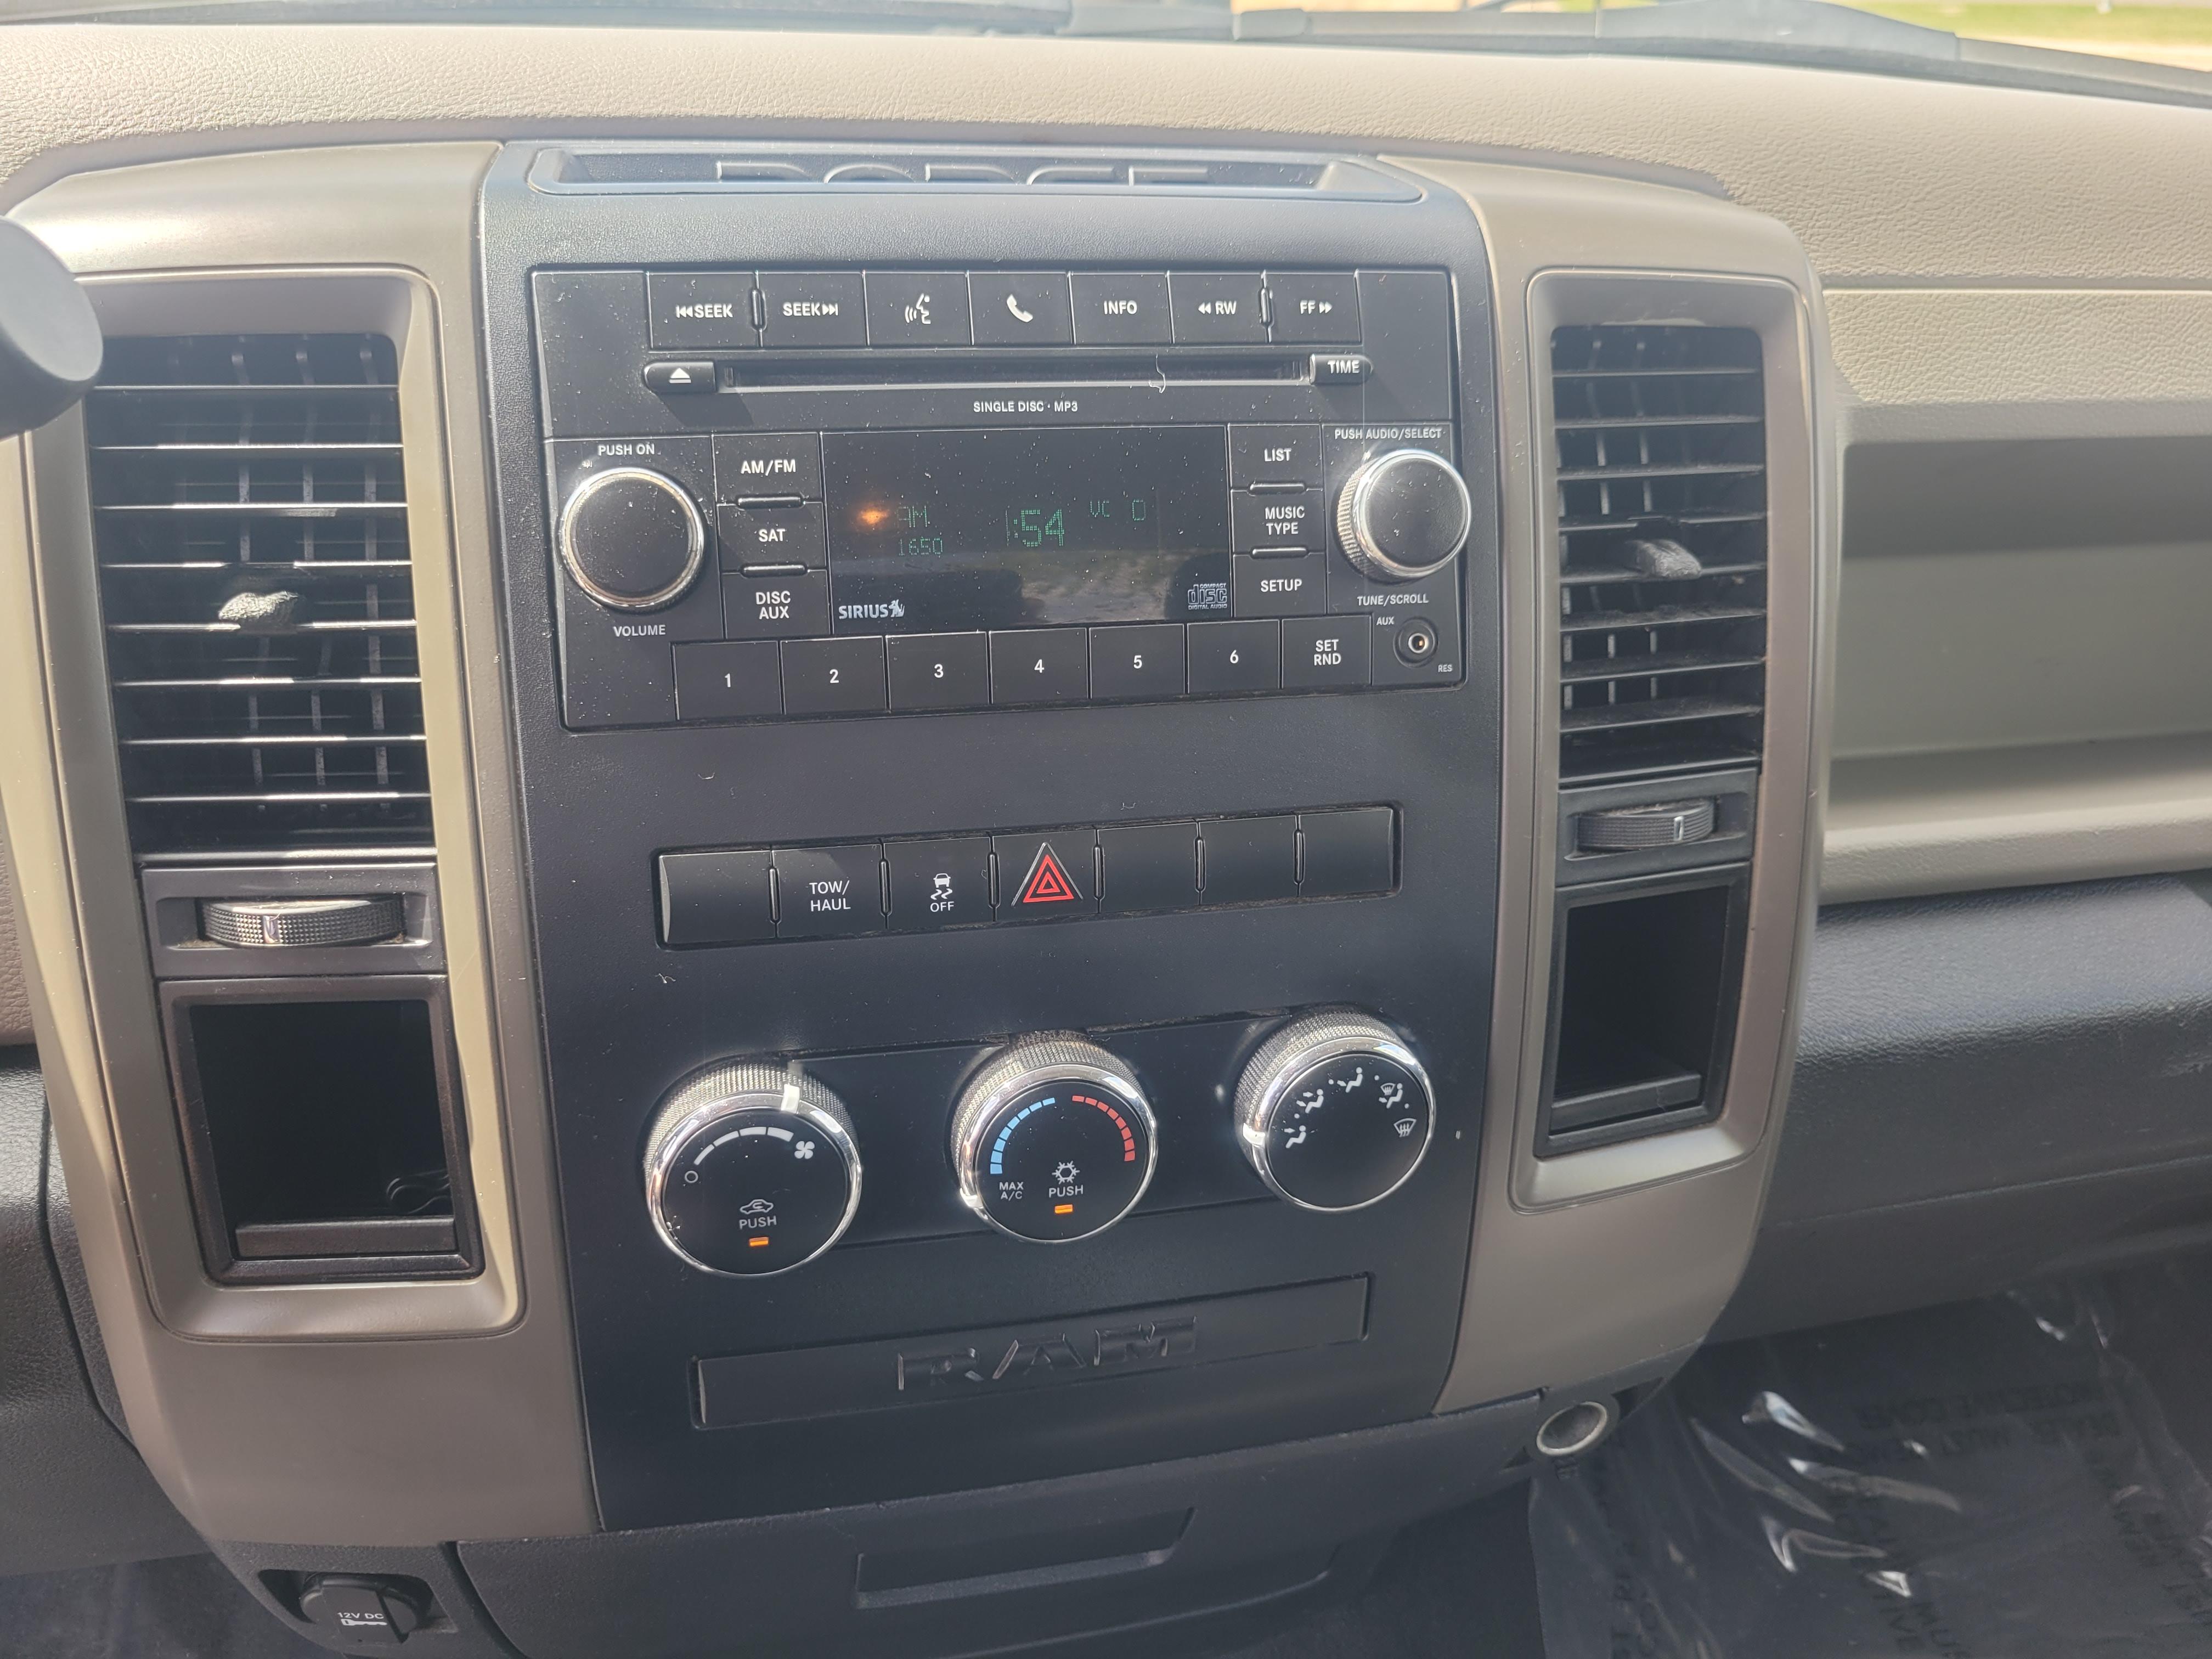 used vehicle - Truck RAM 1500 2011